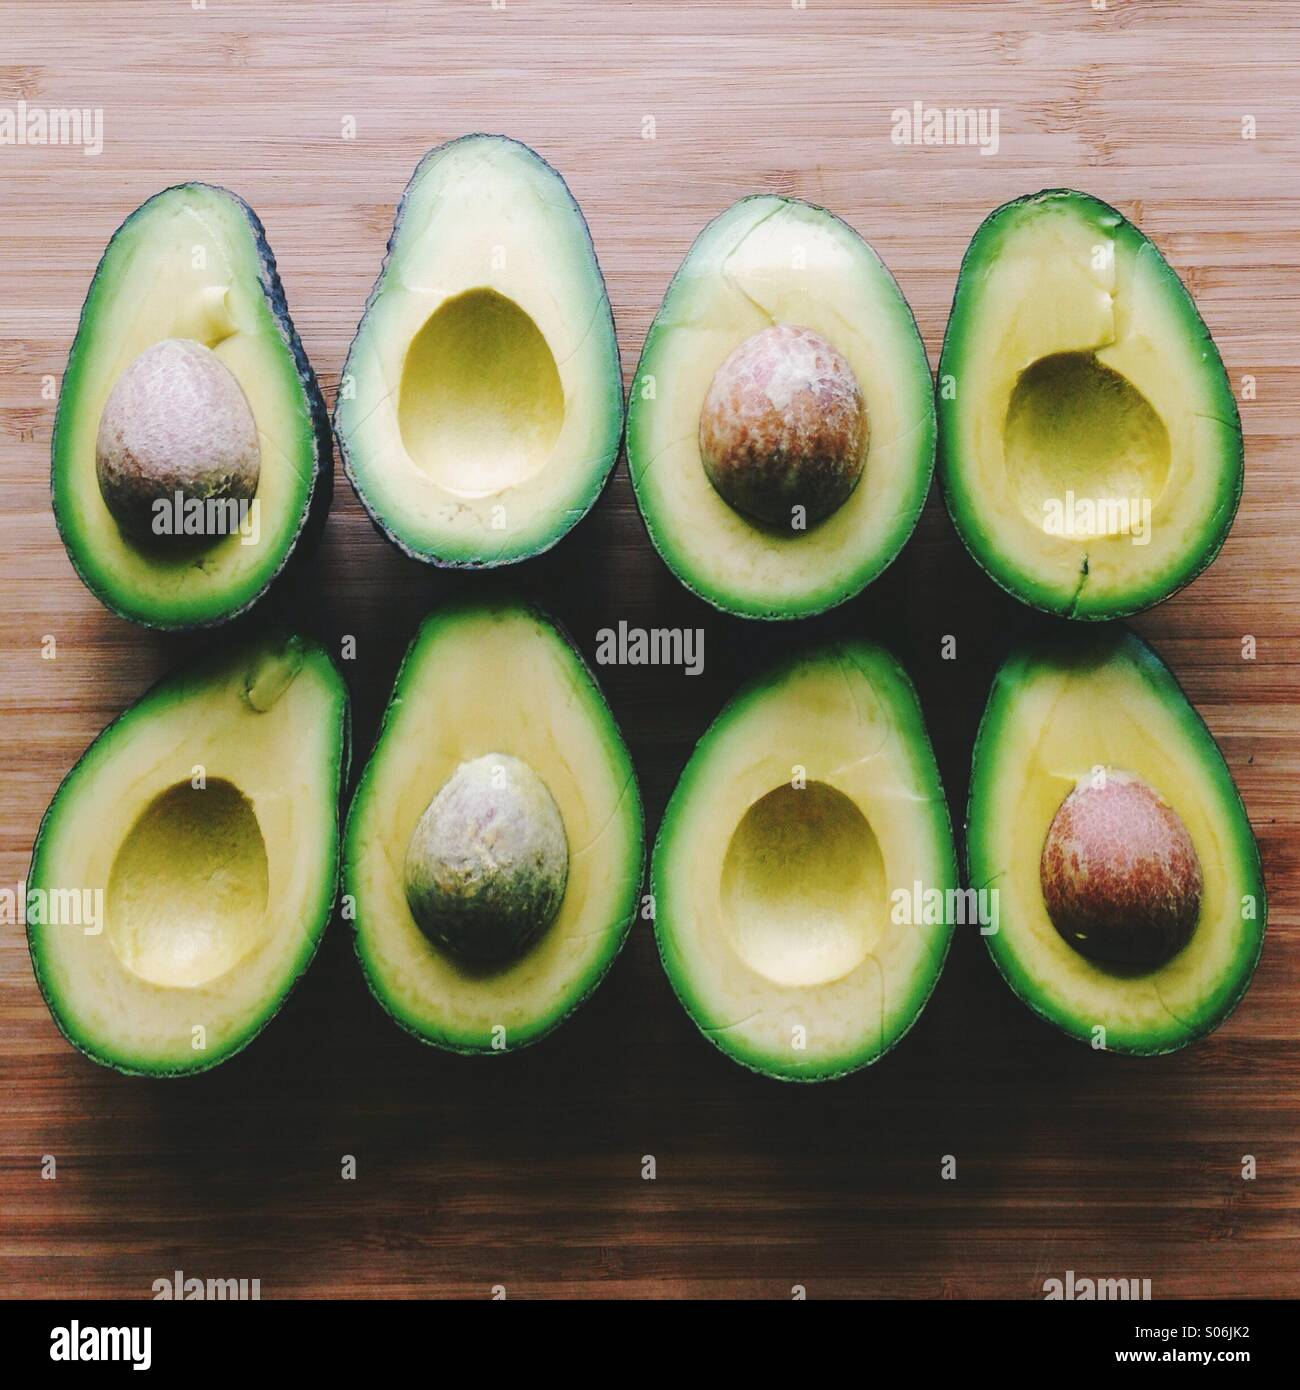 Avocado Halves - Stock Image